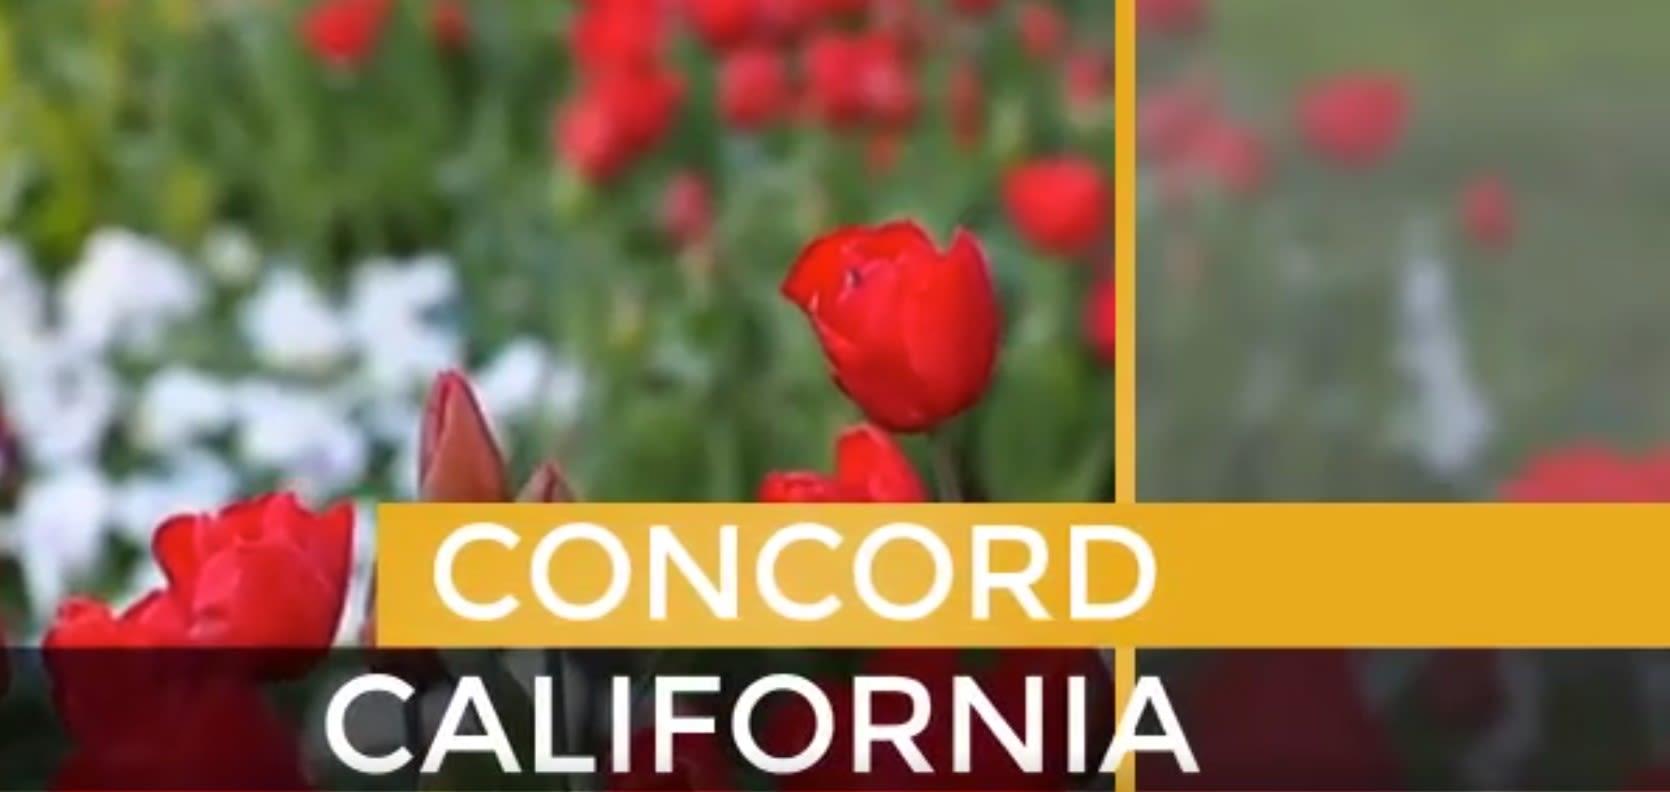 Concord video preview